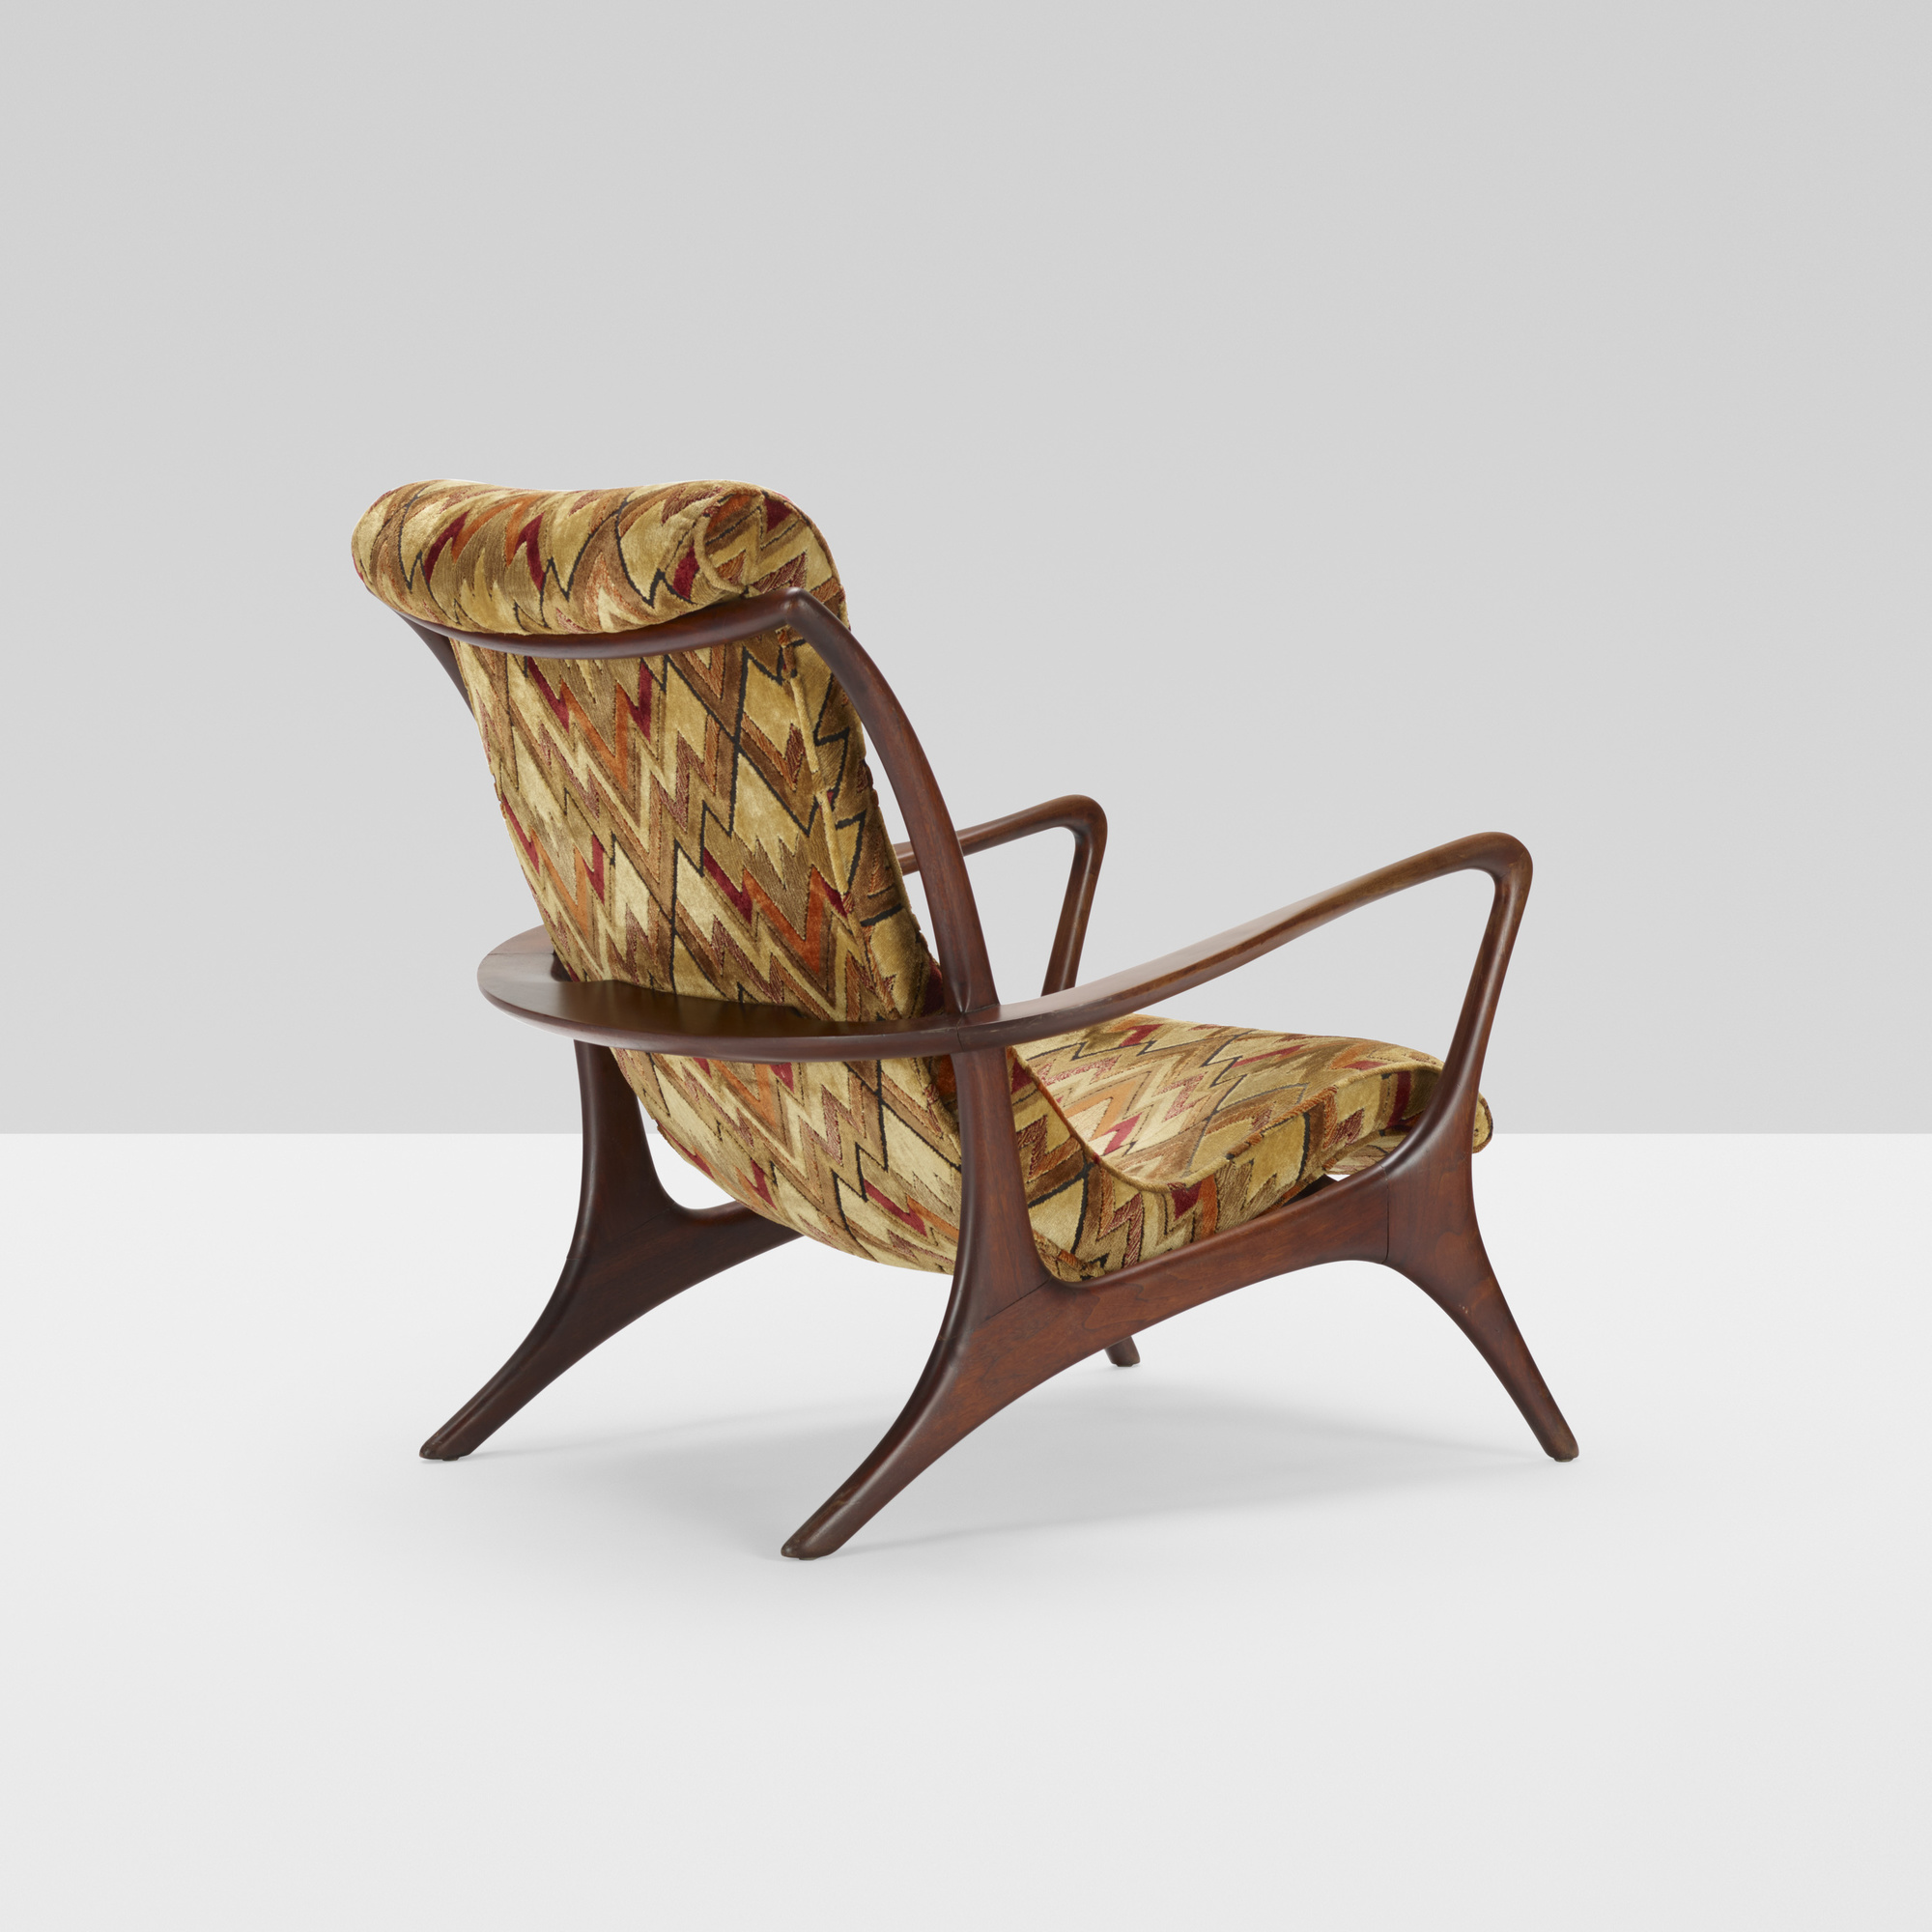 409: Vladimir Kagan / High Back Sculptured Contoured chair (1 of 3)